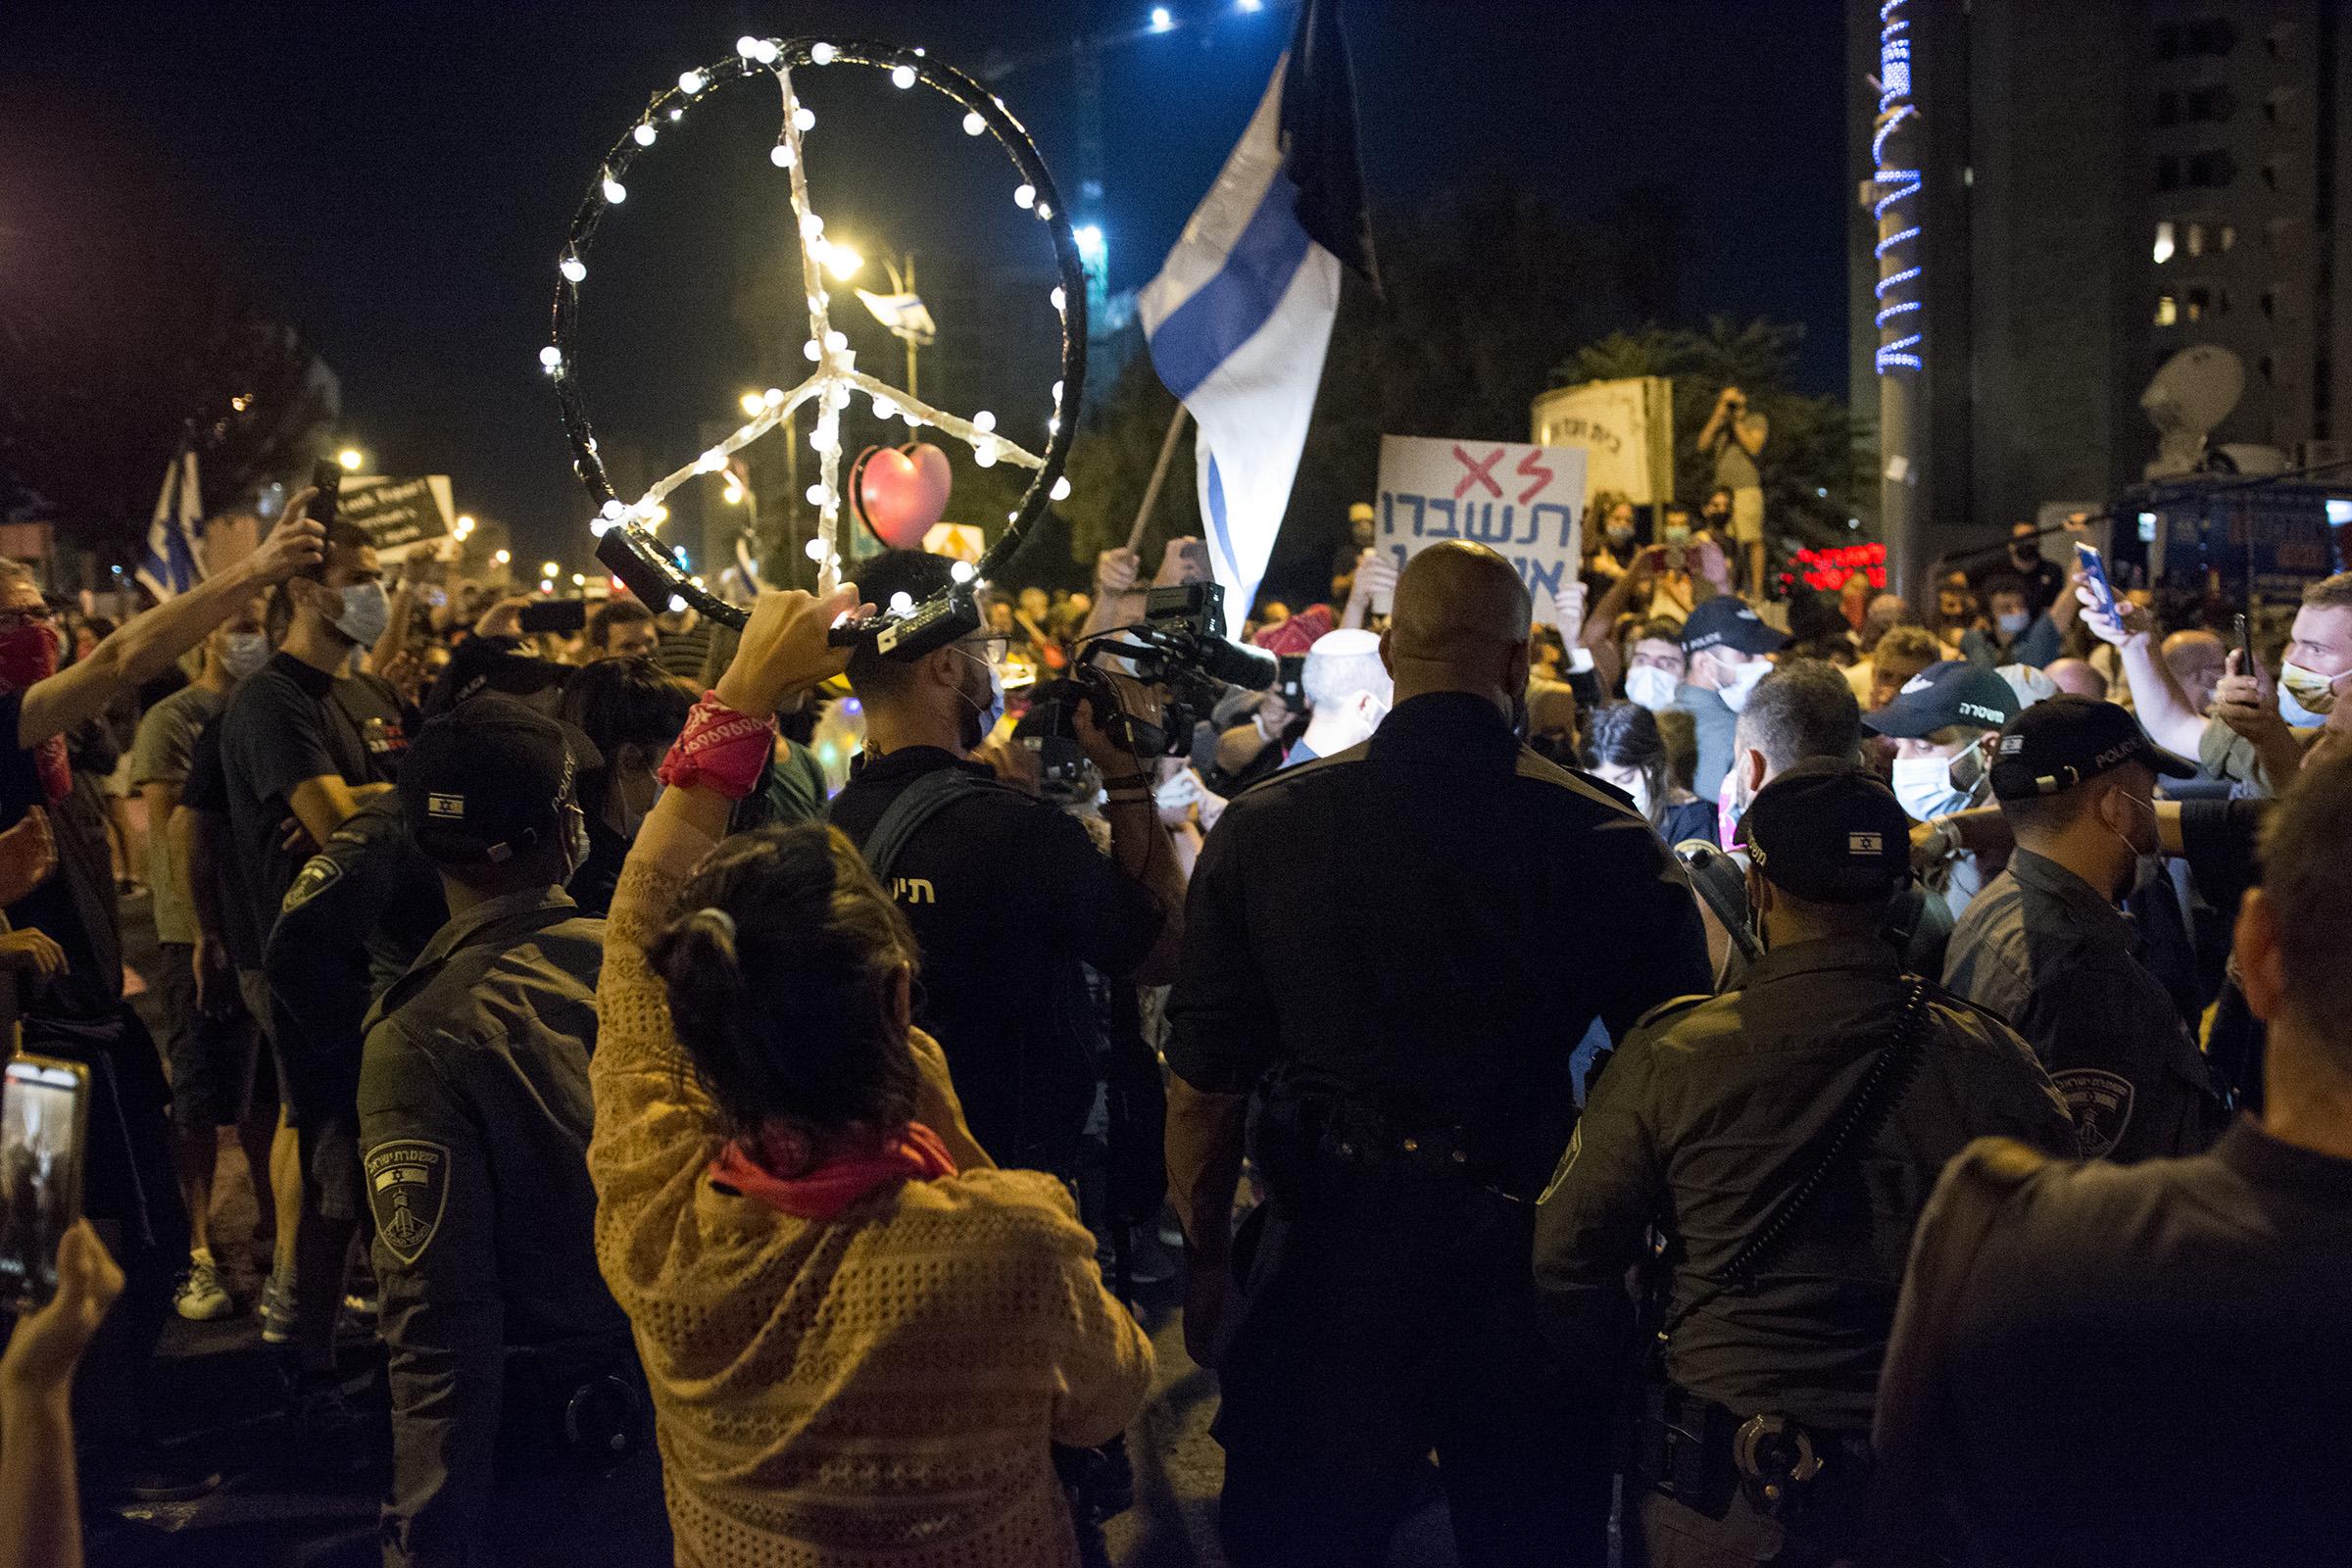 Manifestation against ban on manifestations in Israel